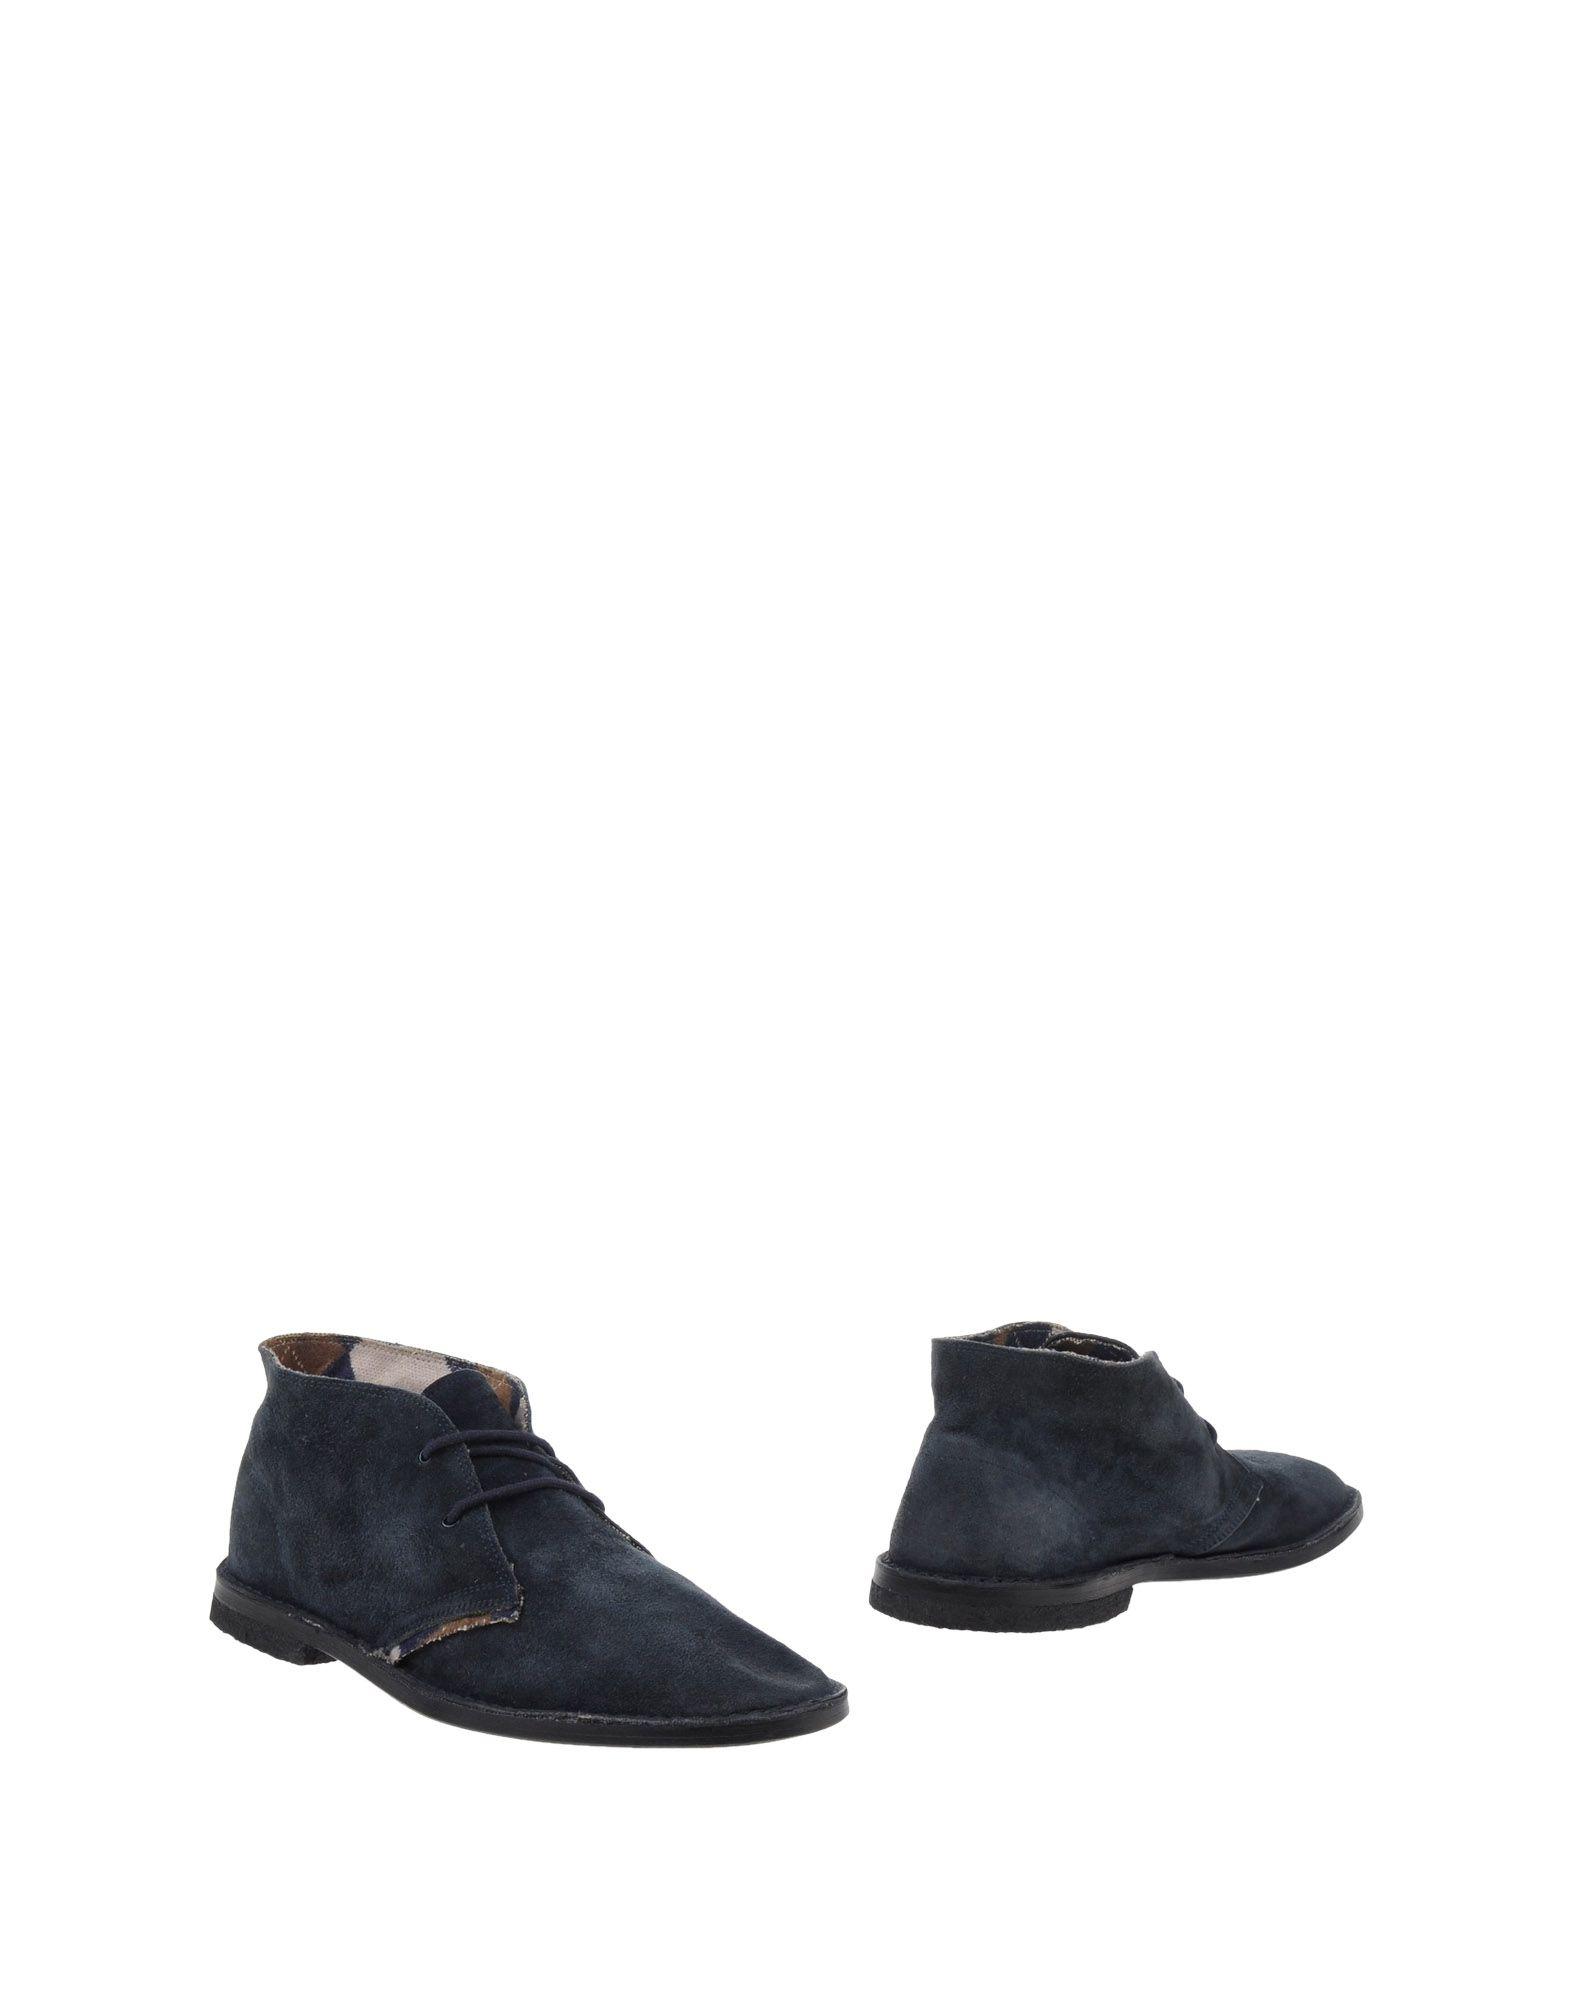 Rabatt echte Schuhe Le Crown 11029631GM Stiefelette Herren  11029631GM Crown 7a7468